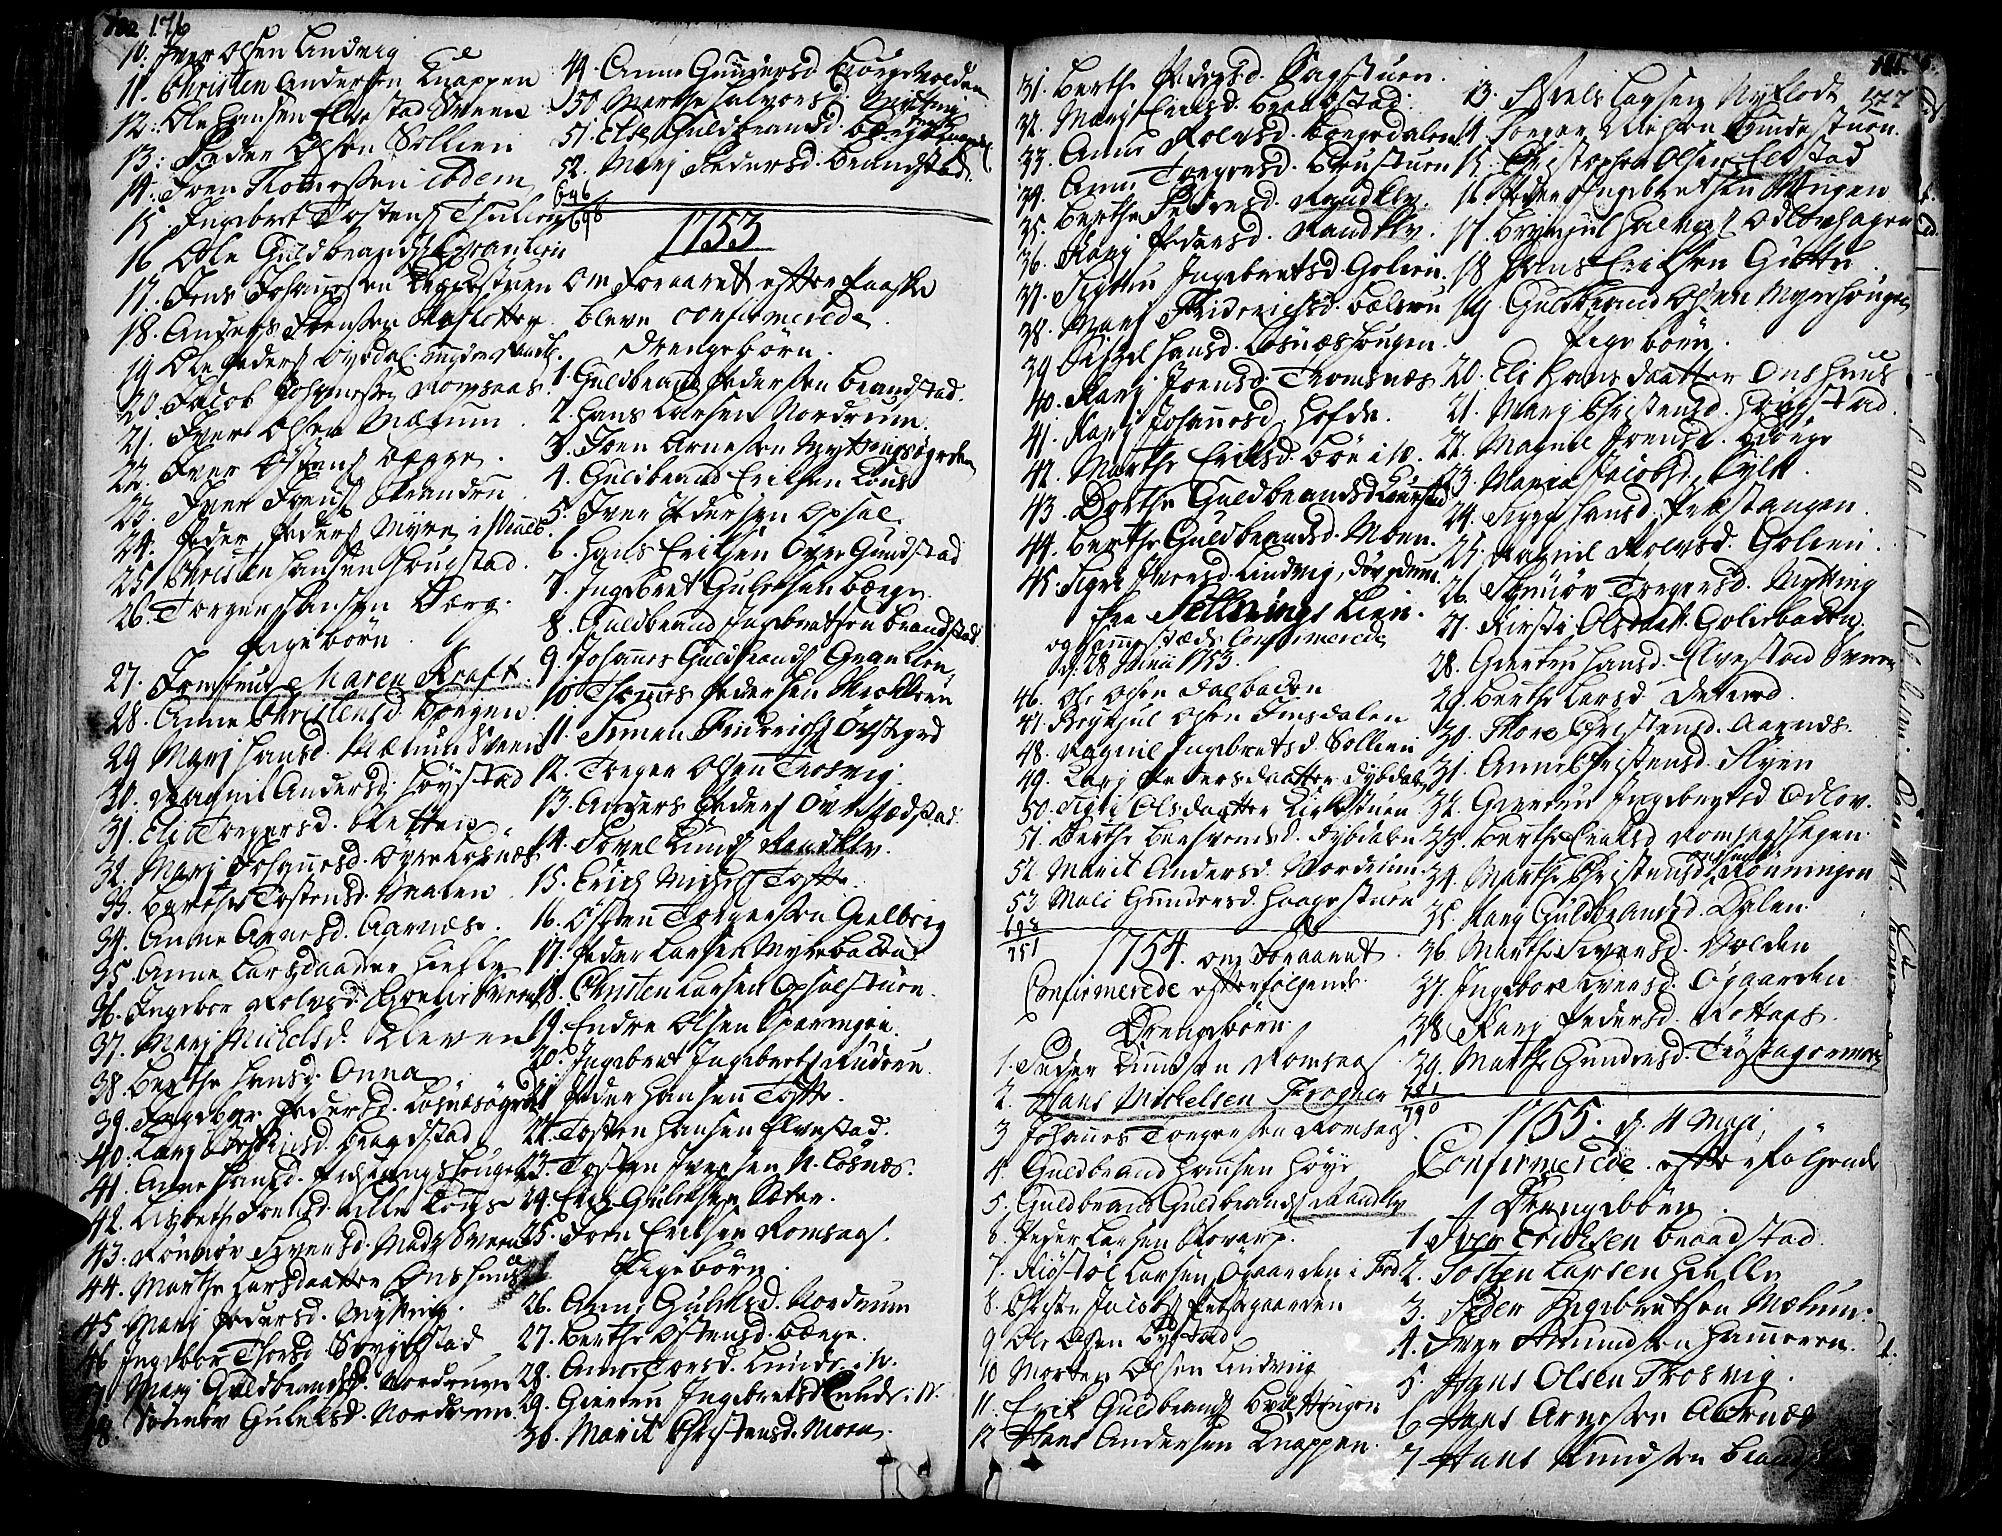 SAH, Ringebu prestekontor, Ministerialbok nr. 2, 1734-1780, s. 176-177